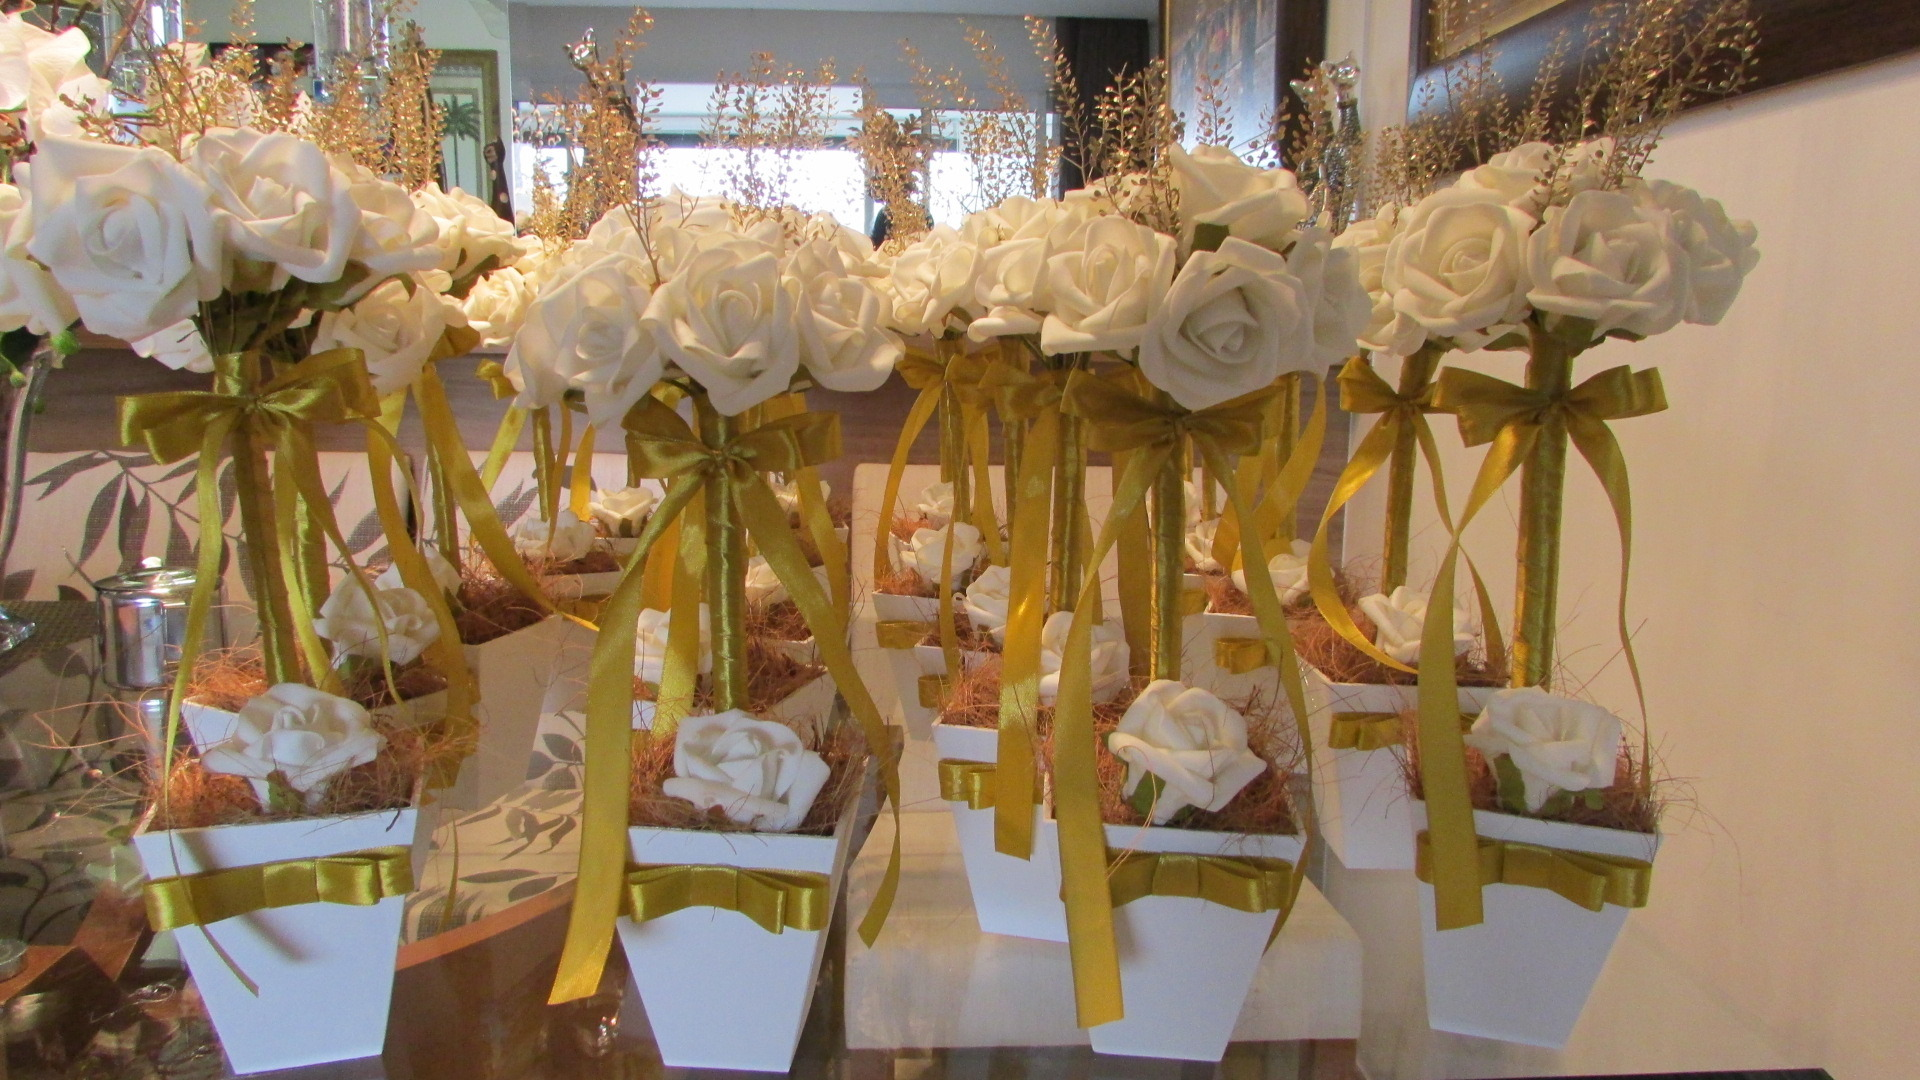 decoracao branca e dourada para casamento : decoracao branca e dourada para casamento:topiara branco e dourado i topiara flores topiara branco e dourado i